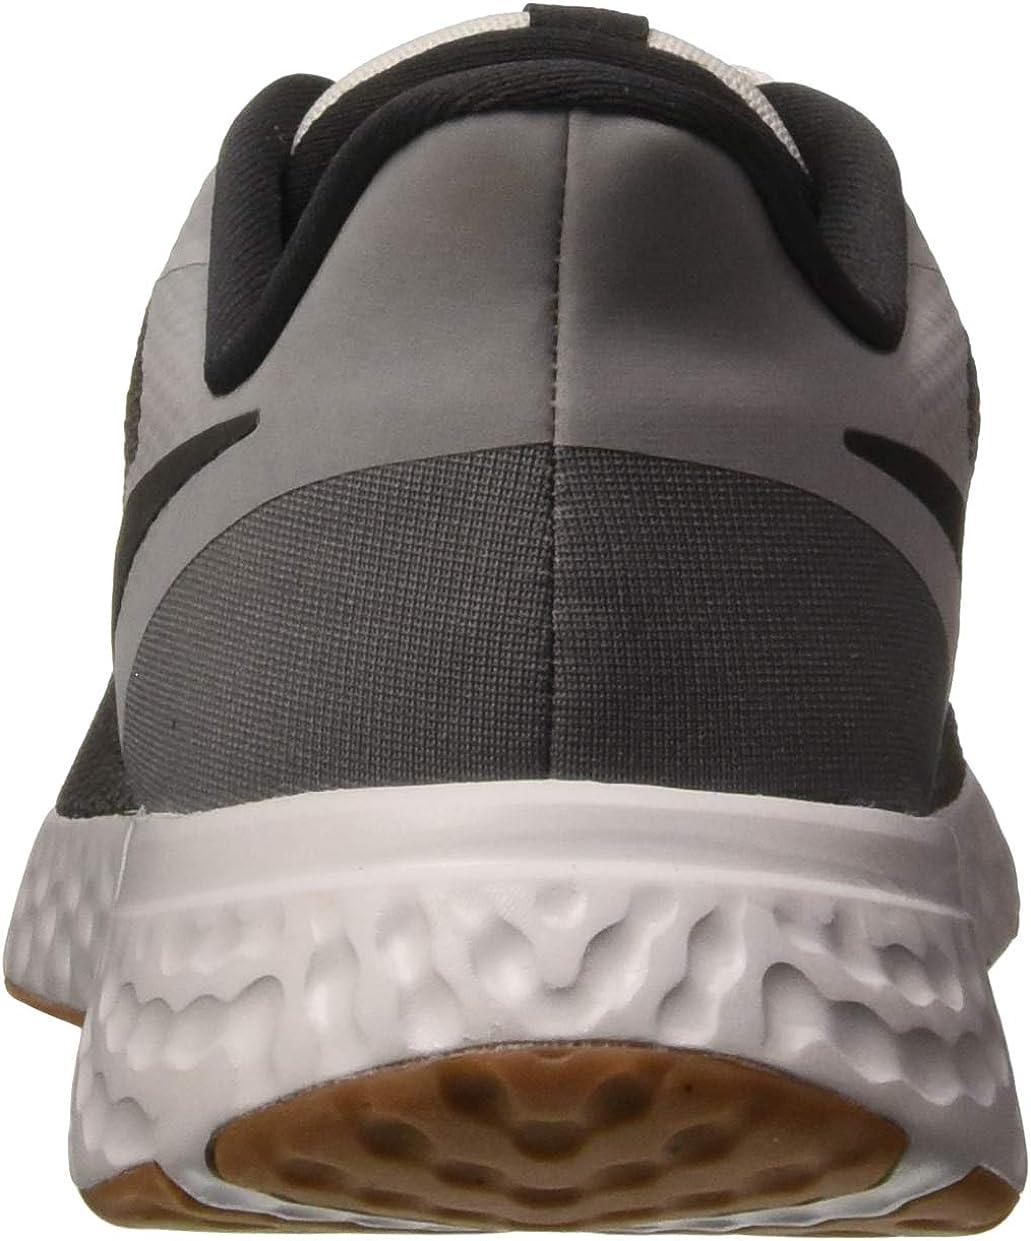 Desconocido Nike Revolution 5 Zapatillas de Atletismo para Hombre